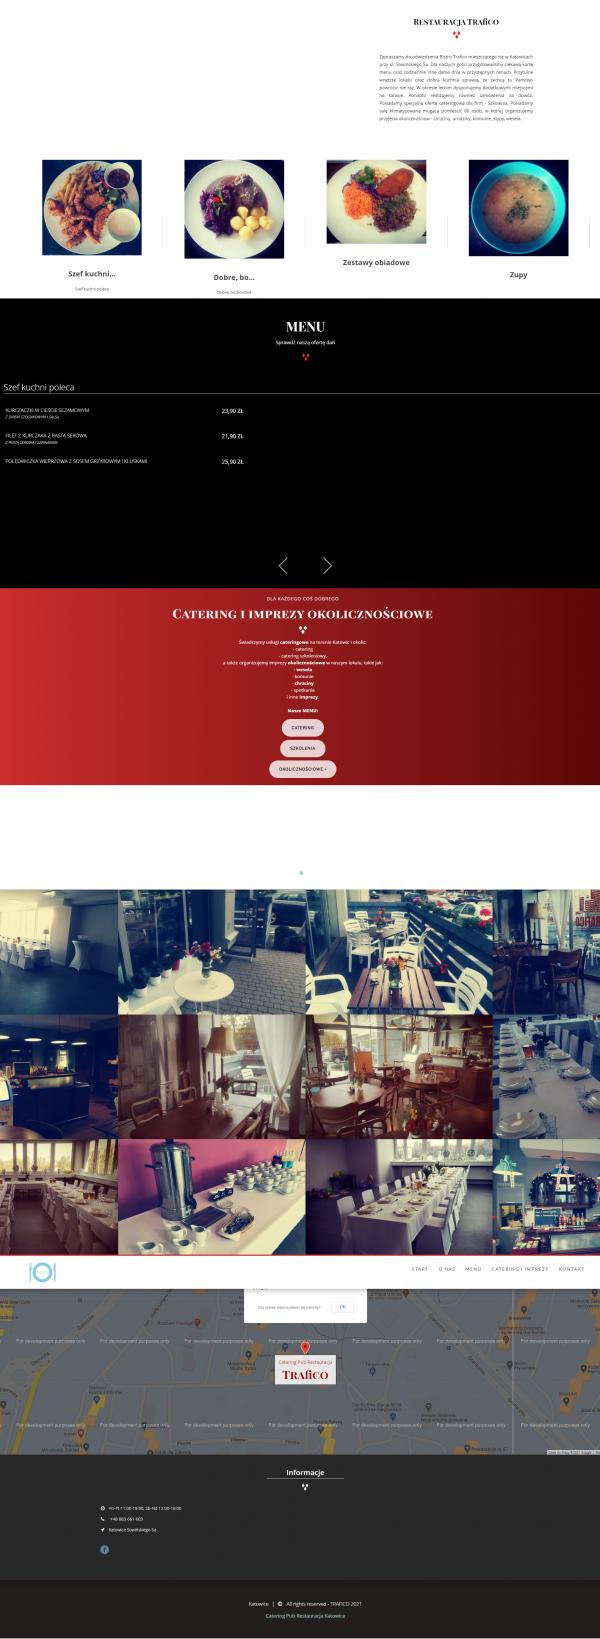 Pauron Studios for Restaurants